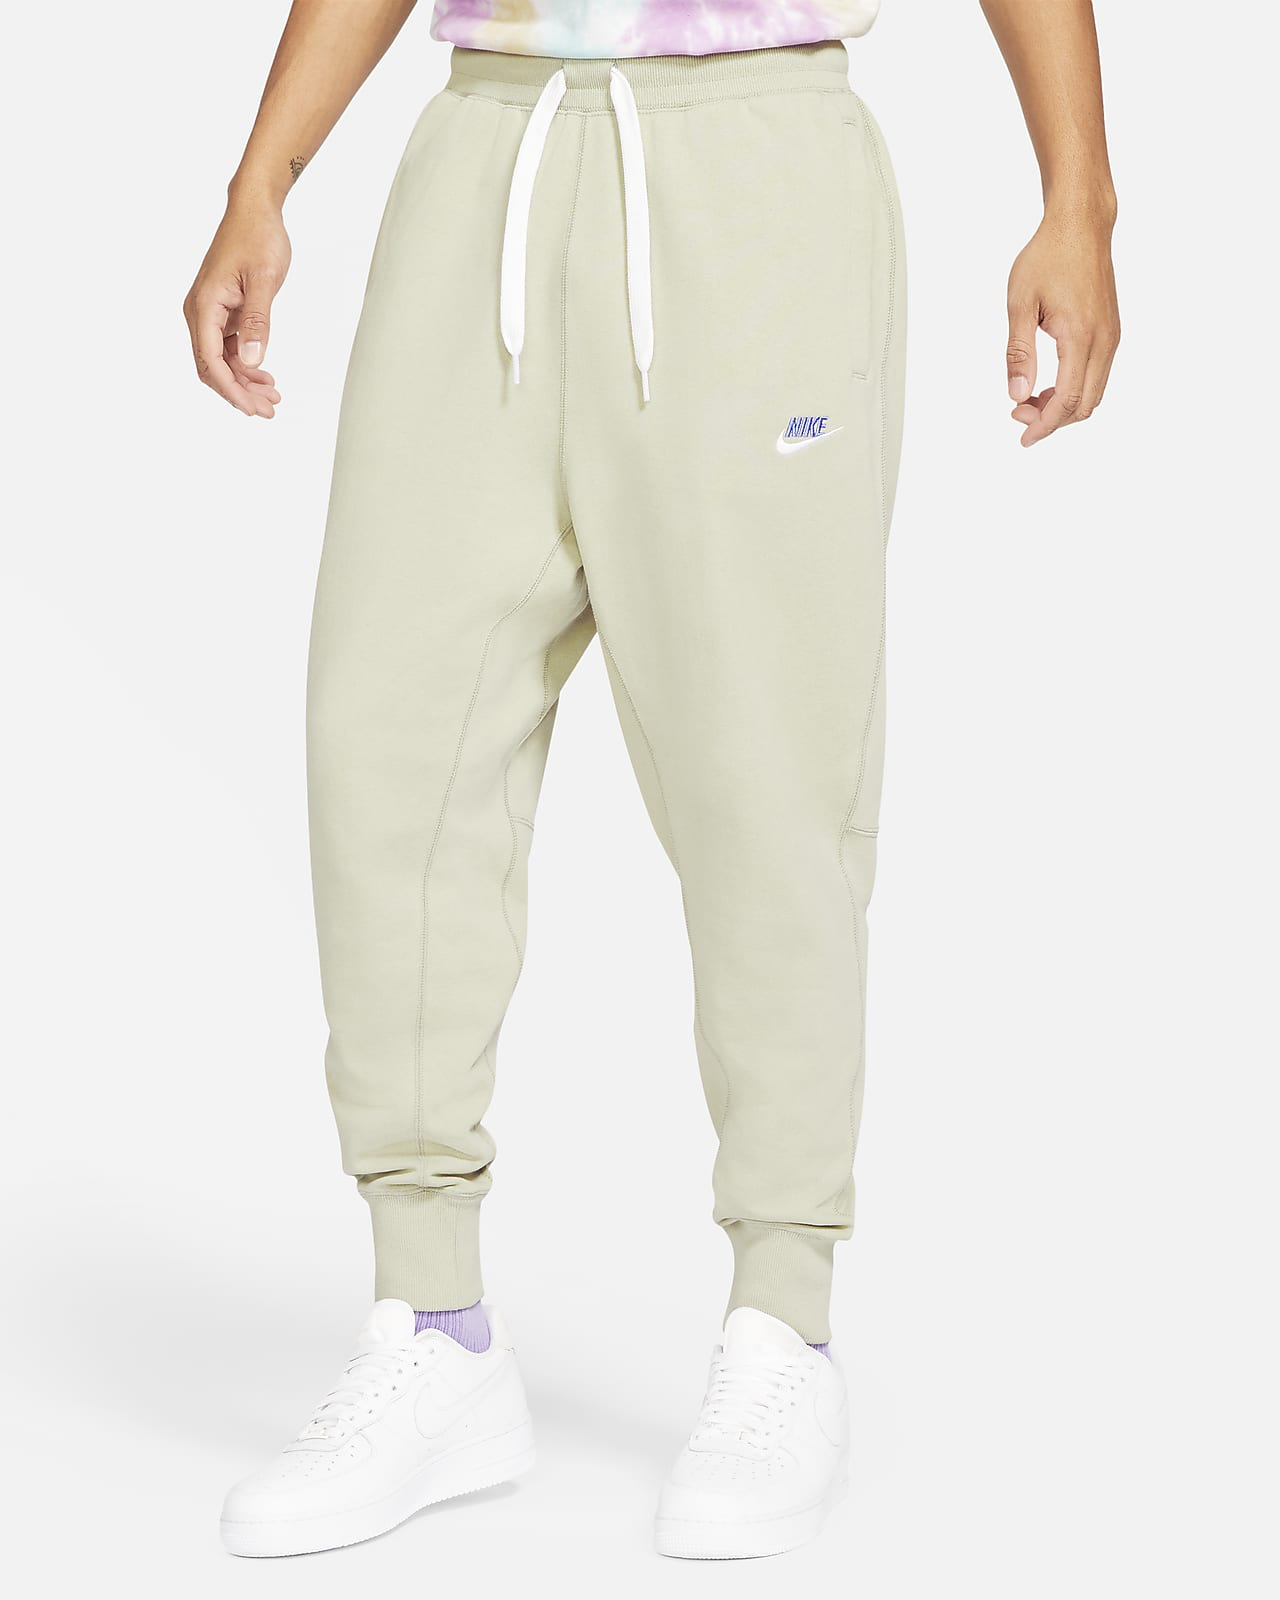 Nike Sportswear Men's French Terry Pants